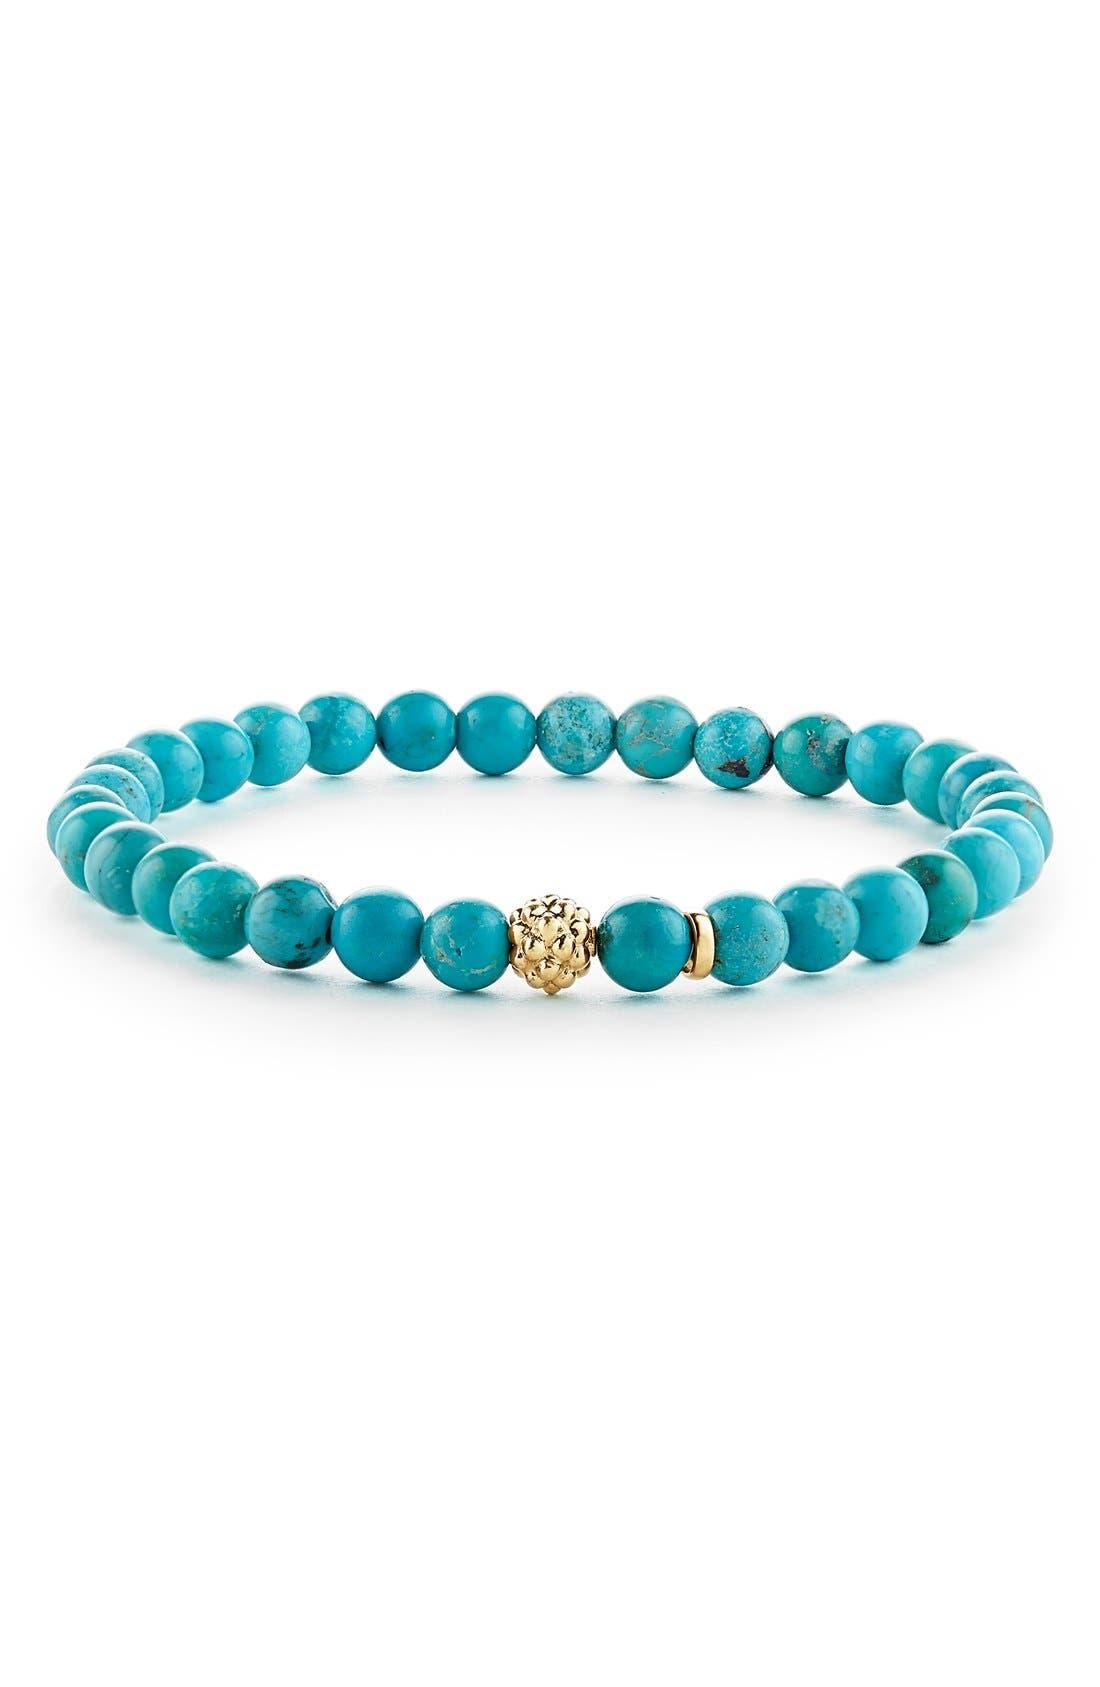 'Caviar Icon' Semiprecious Stone Bracelet,                             Main thumbnail 1, color,                             TURQUOISE/ GOLD